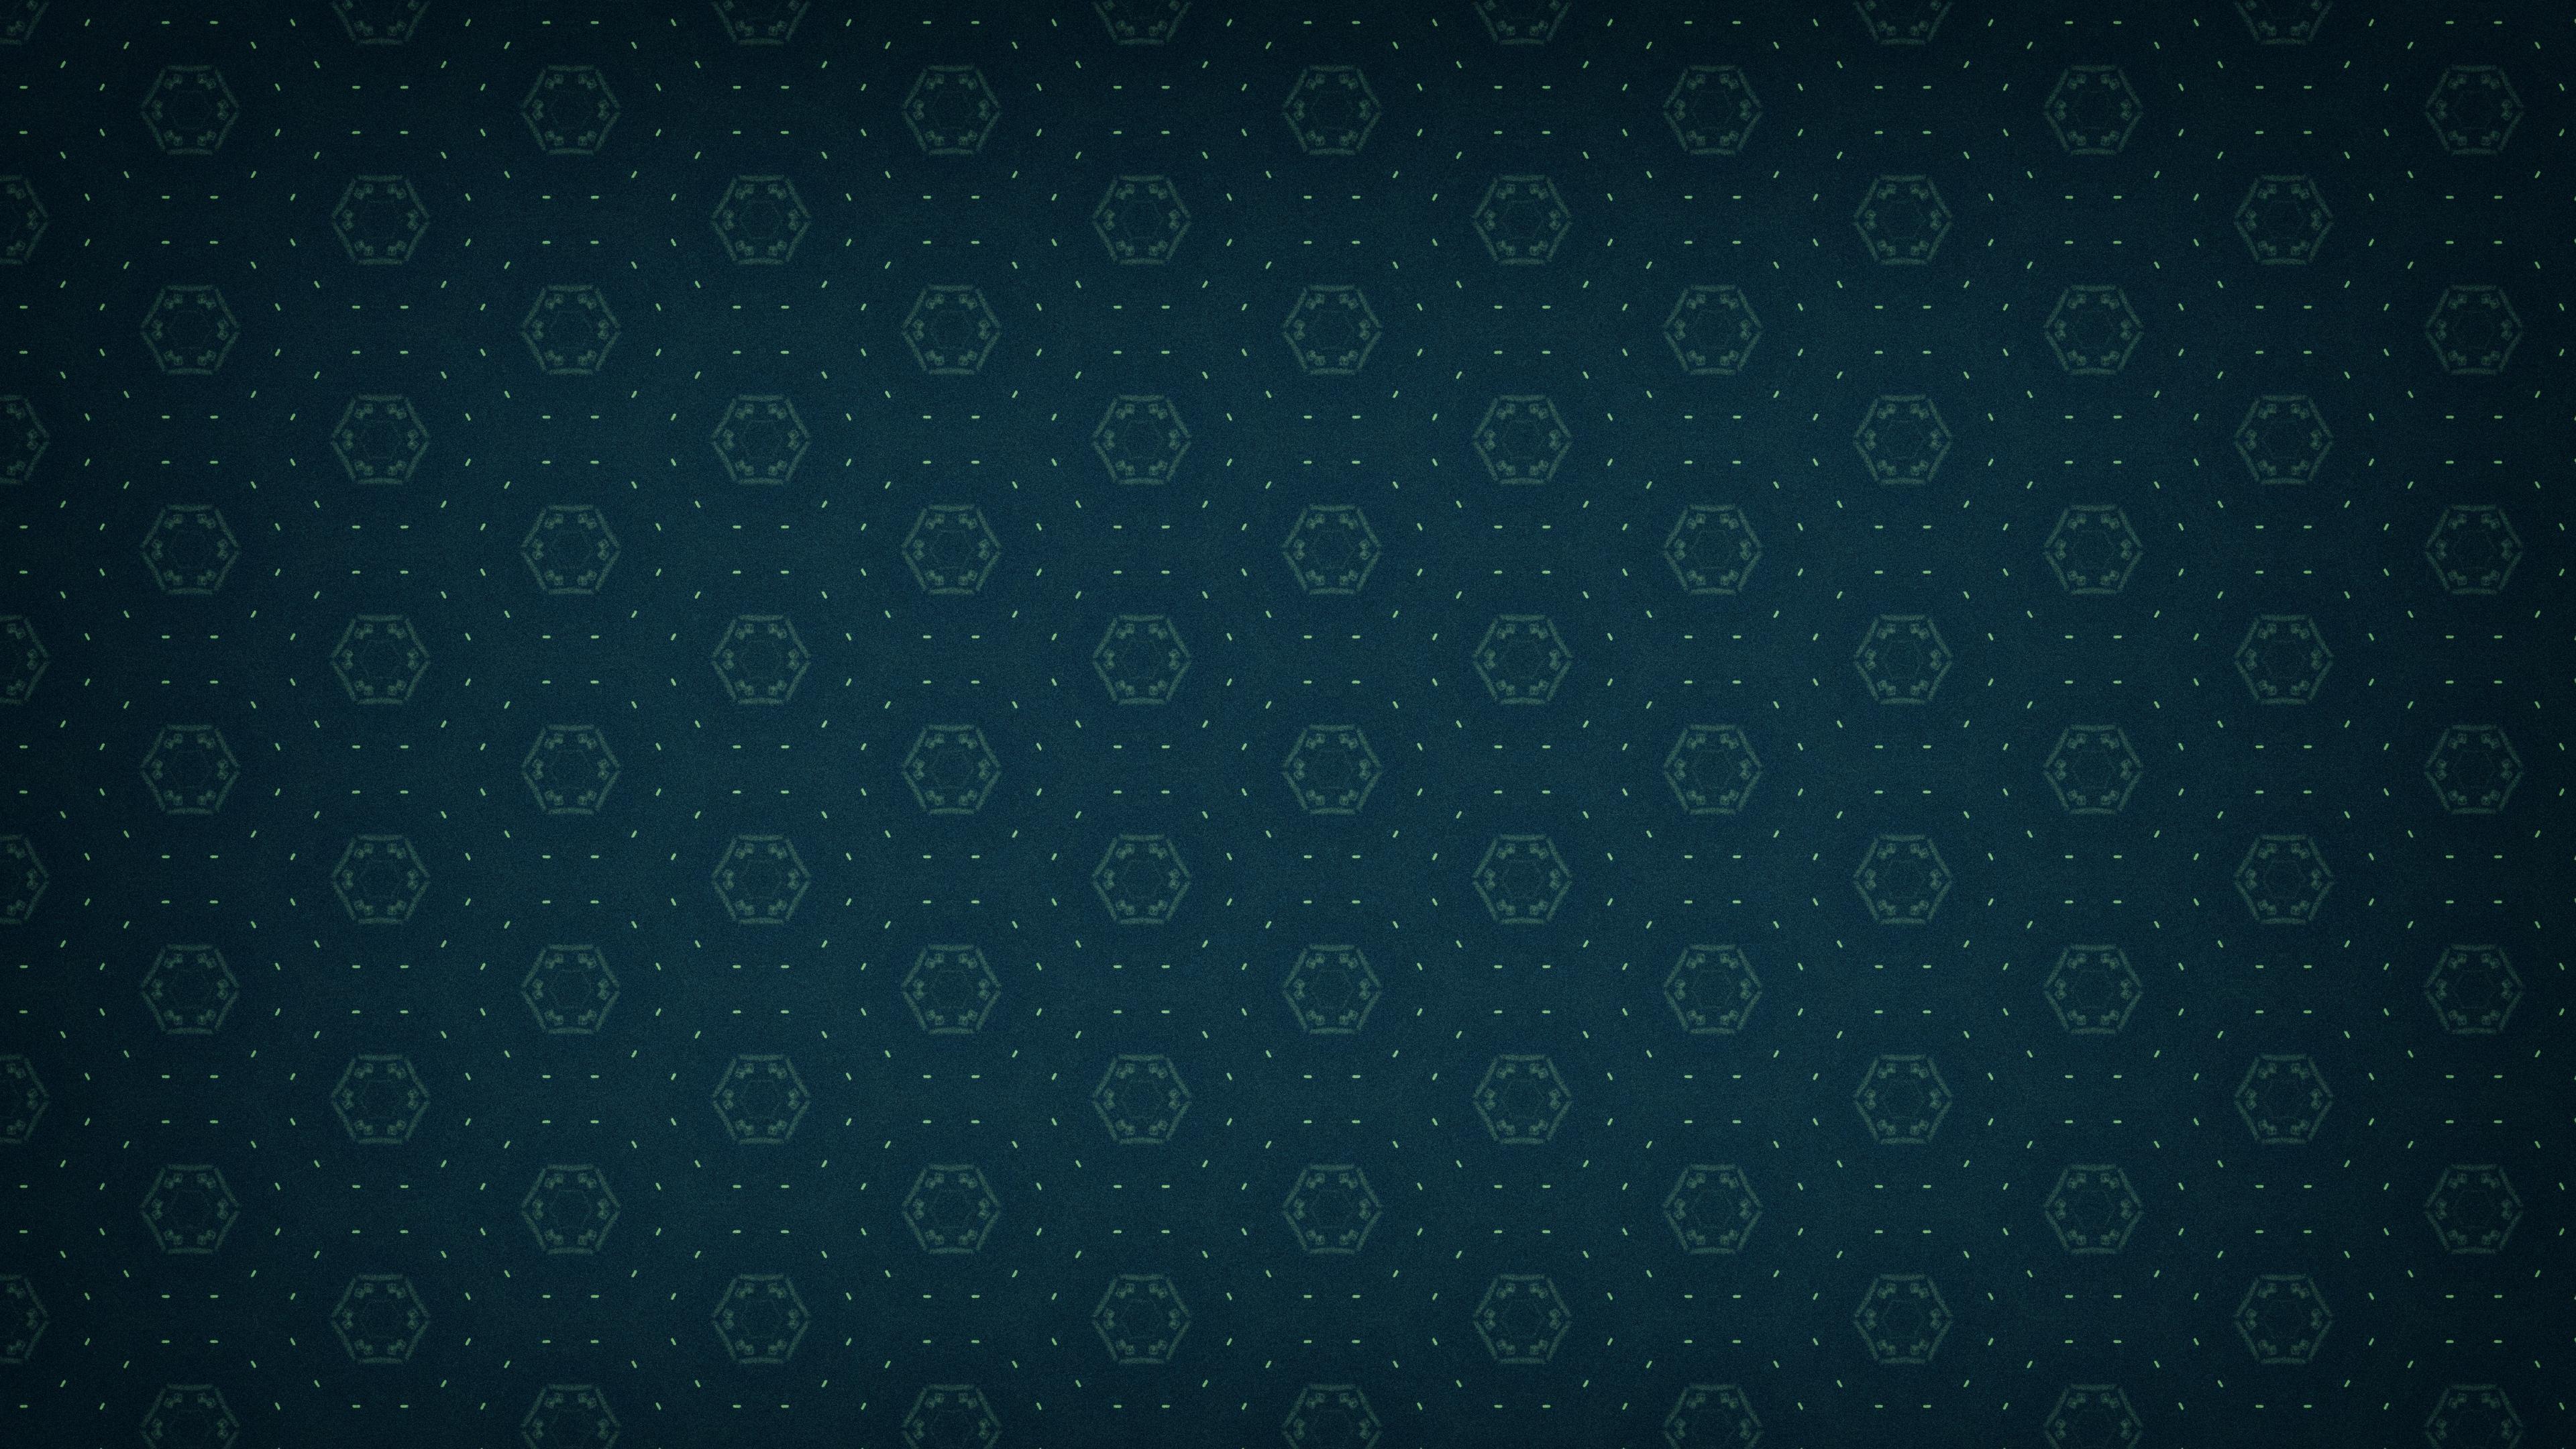 texture patterns graphics 4k 1536097845 - texture, patterns, graphics 4k - Texture, patterns, Graphics